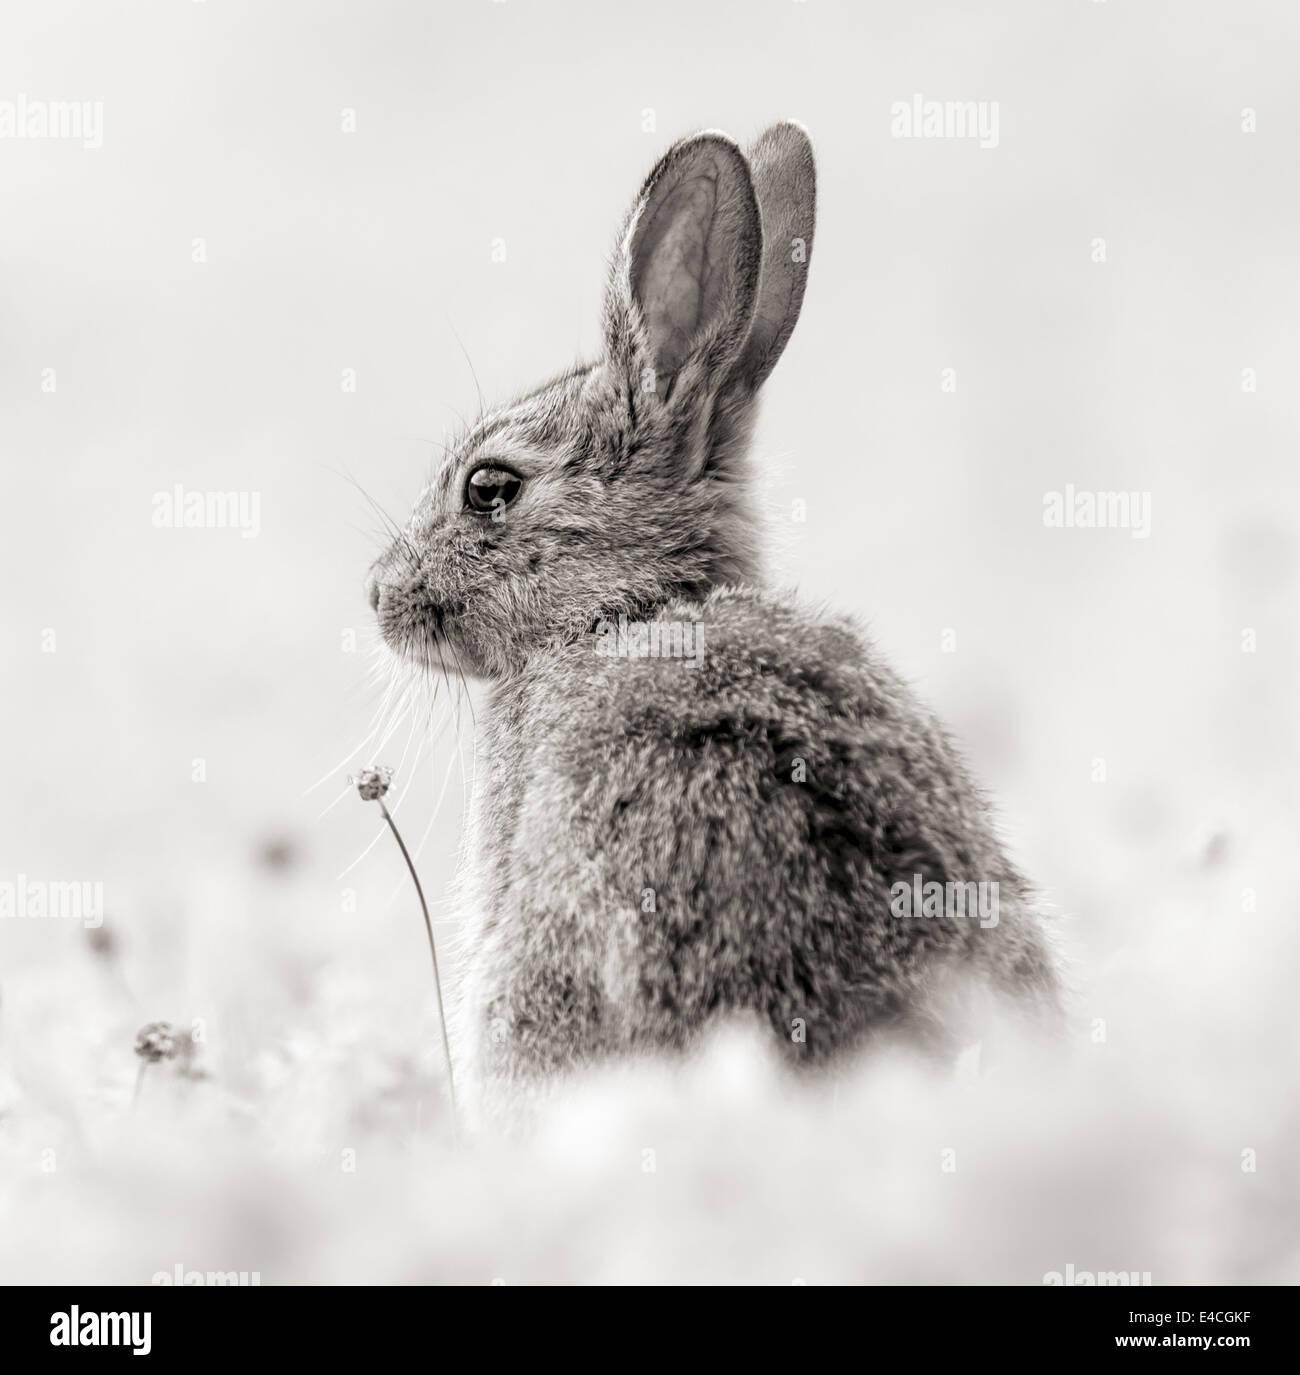 Rabbit in monochrome - Stock Image